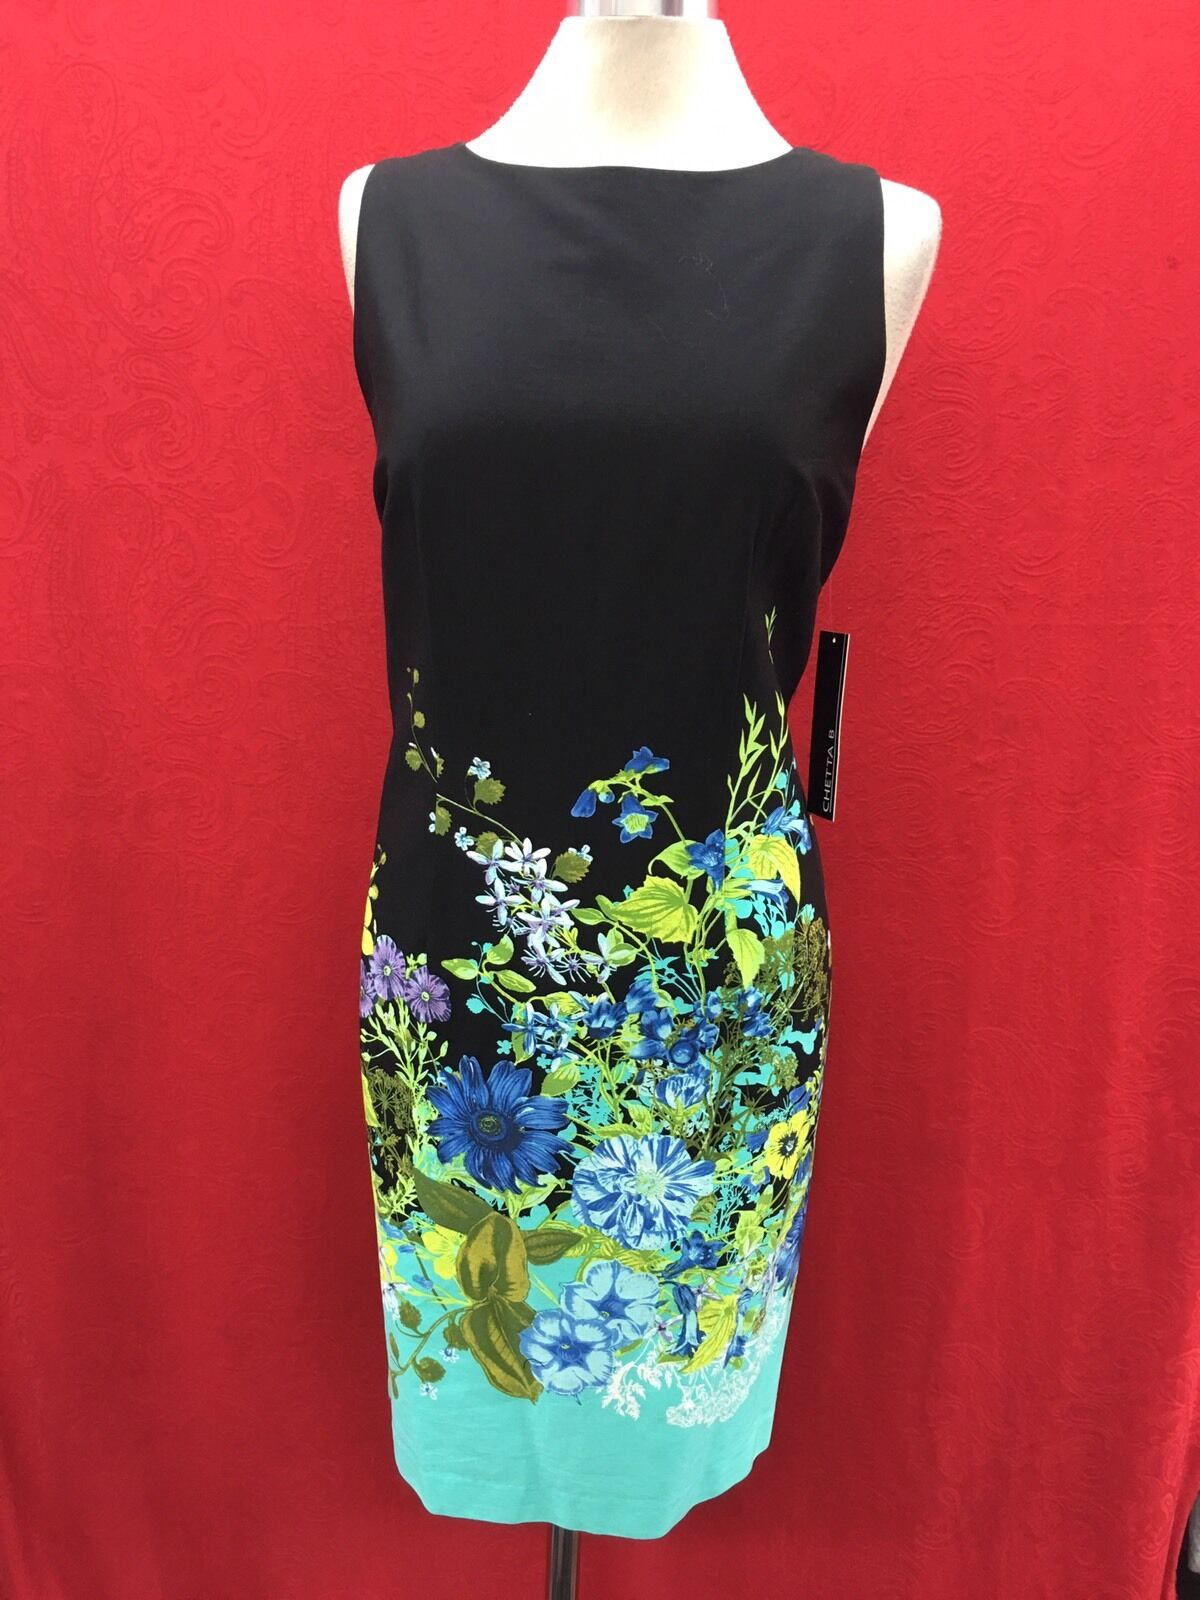 "CHETTA B Vestido Vestido Vestido Nuevo con etiqueta talla 12 Vestido De Algodón Vestido Con Forro longitud 39"" retail  99 0204d7"